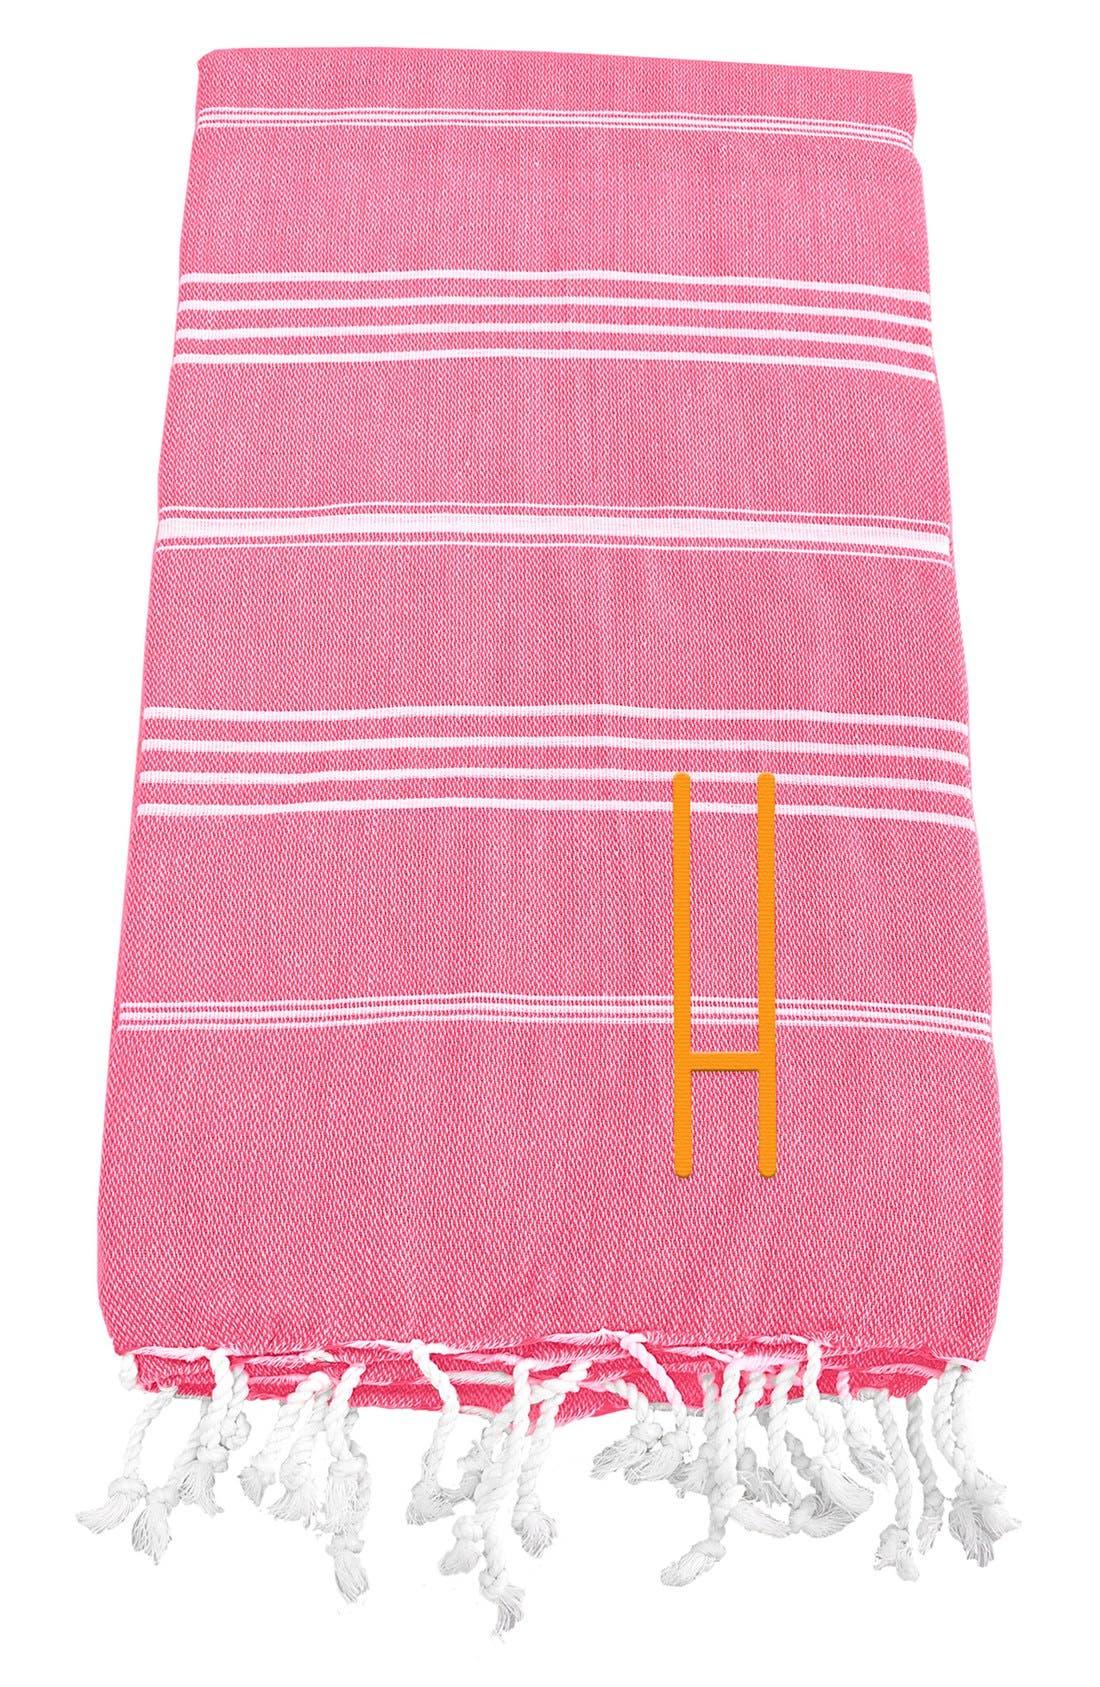 Monogram Turkish Cotton Towel,                             Main thumbnail 144, color,